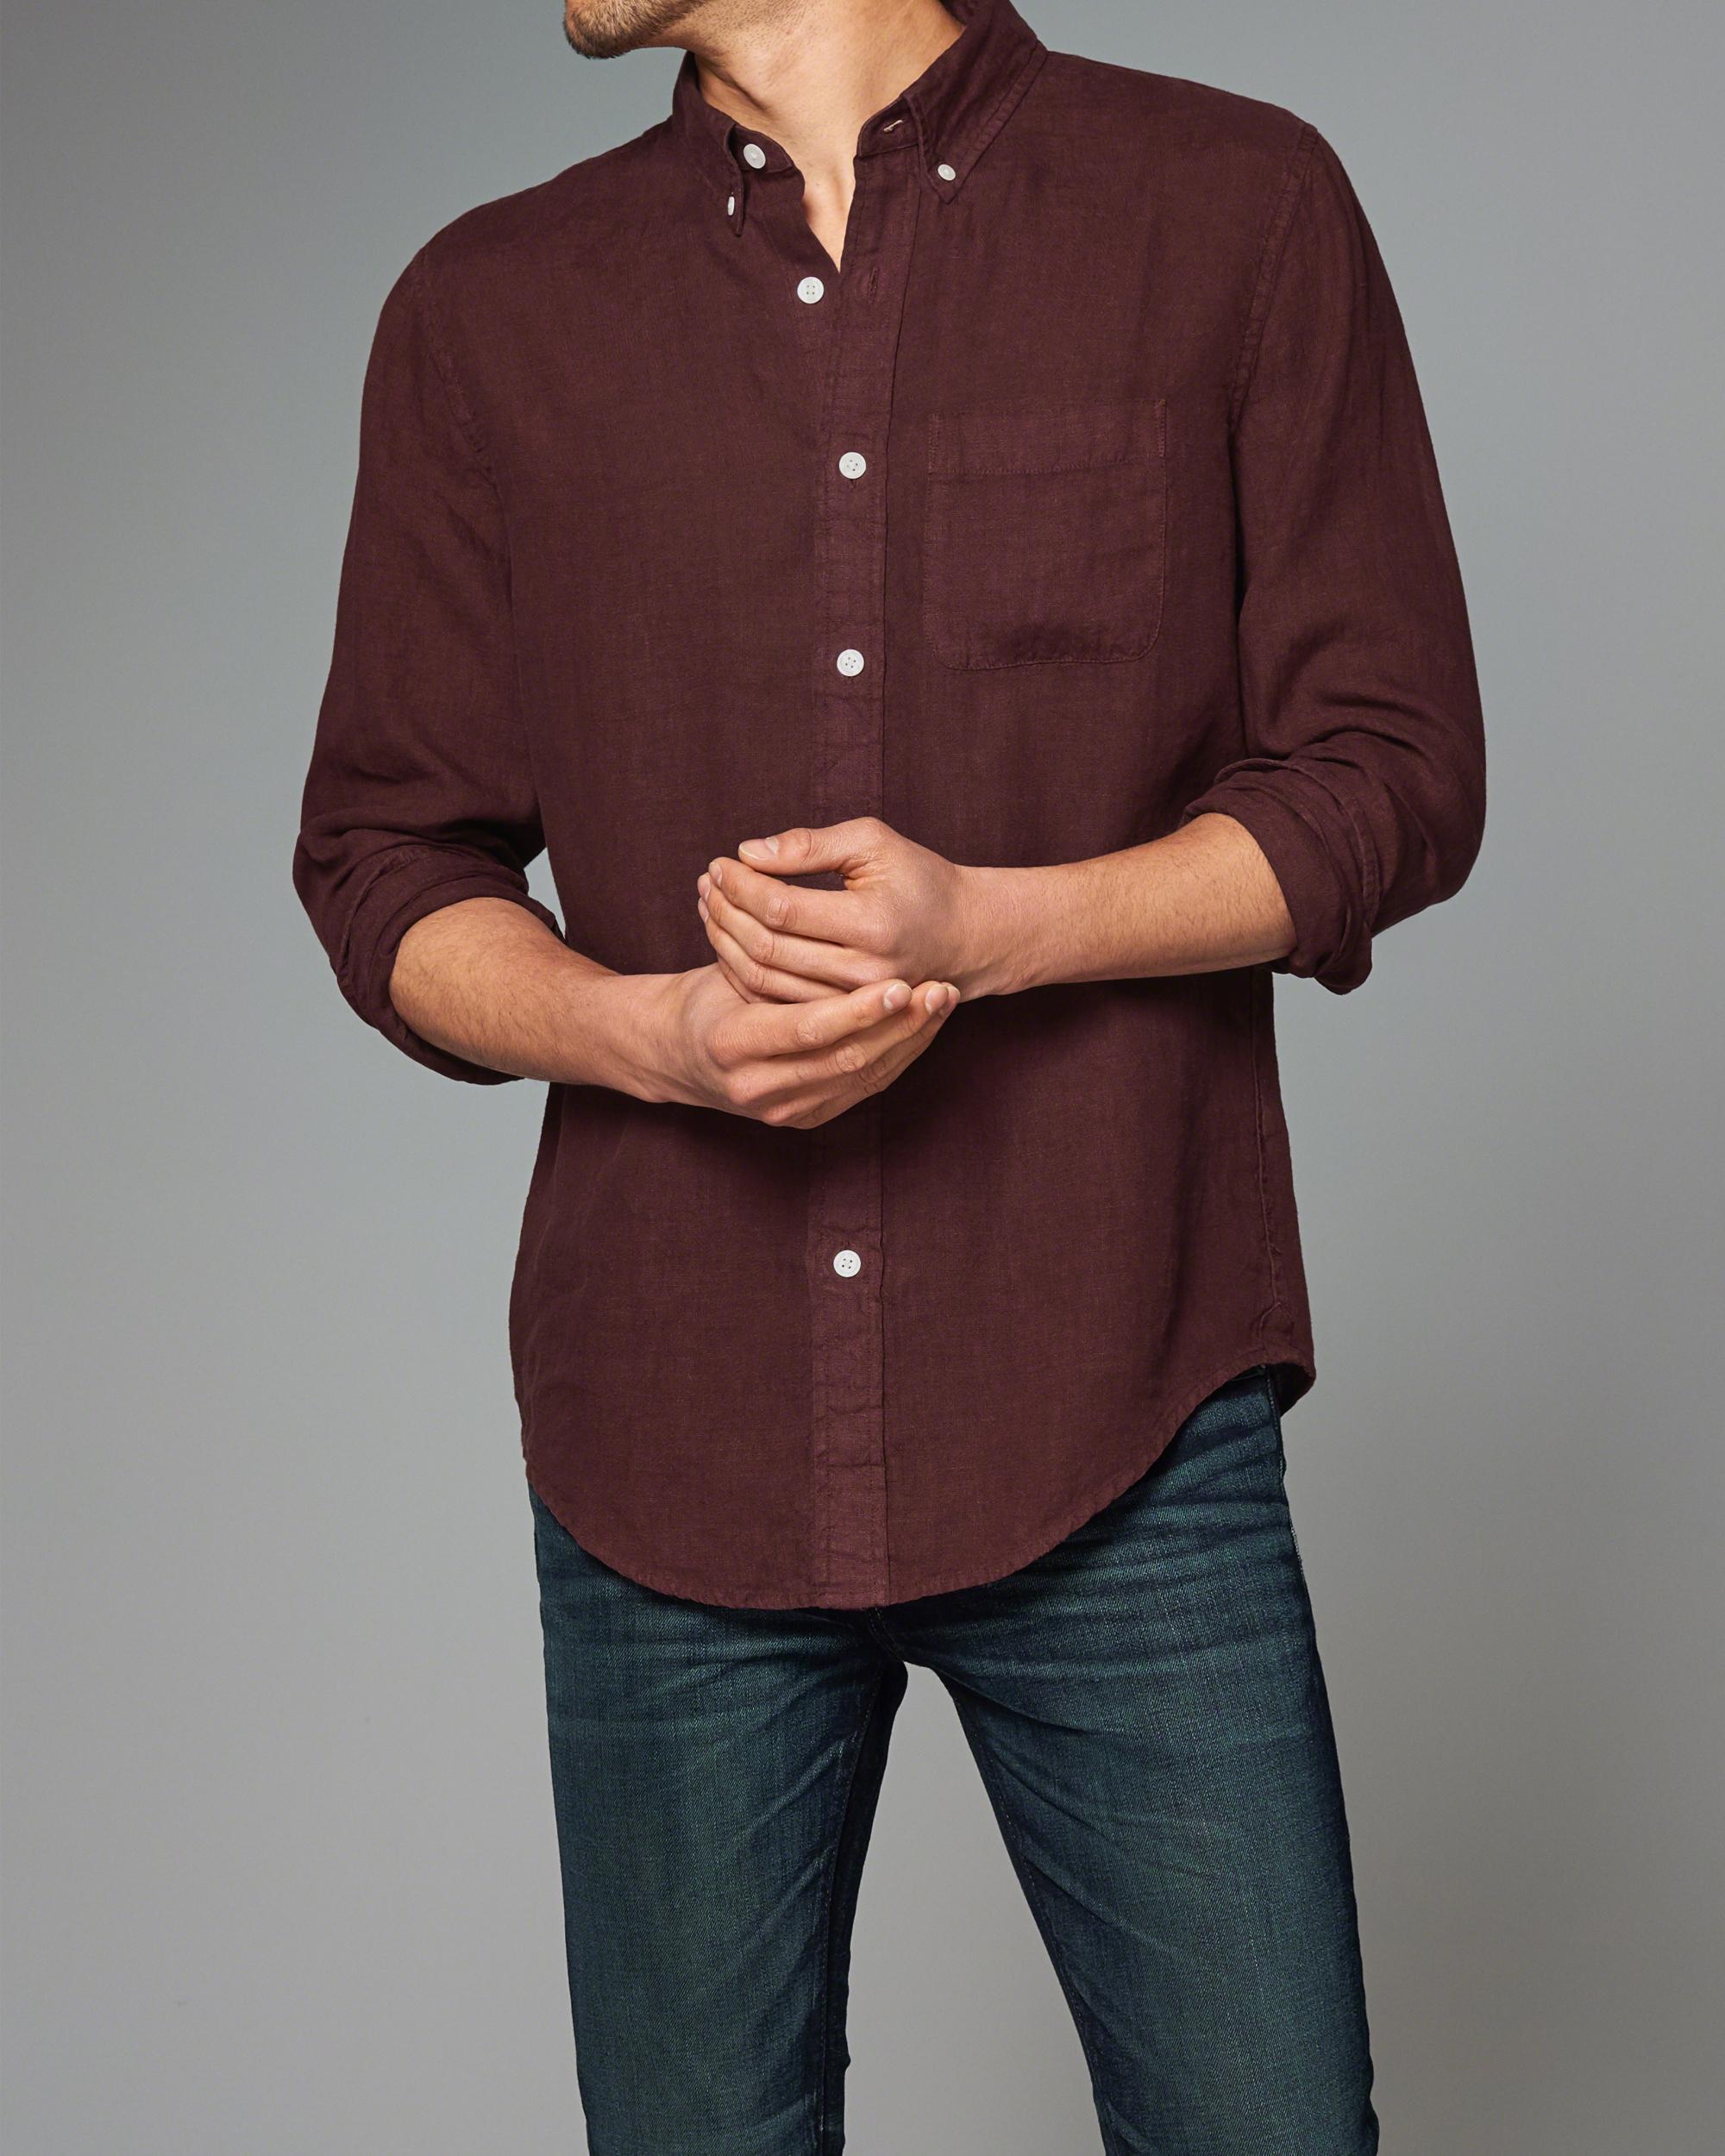 Abercrombie & fitch Garment Dye Linen Shirt in Purple for ...